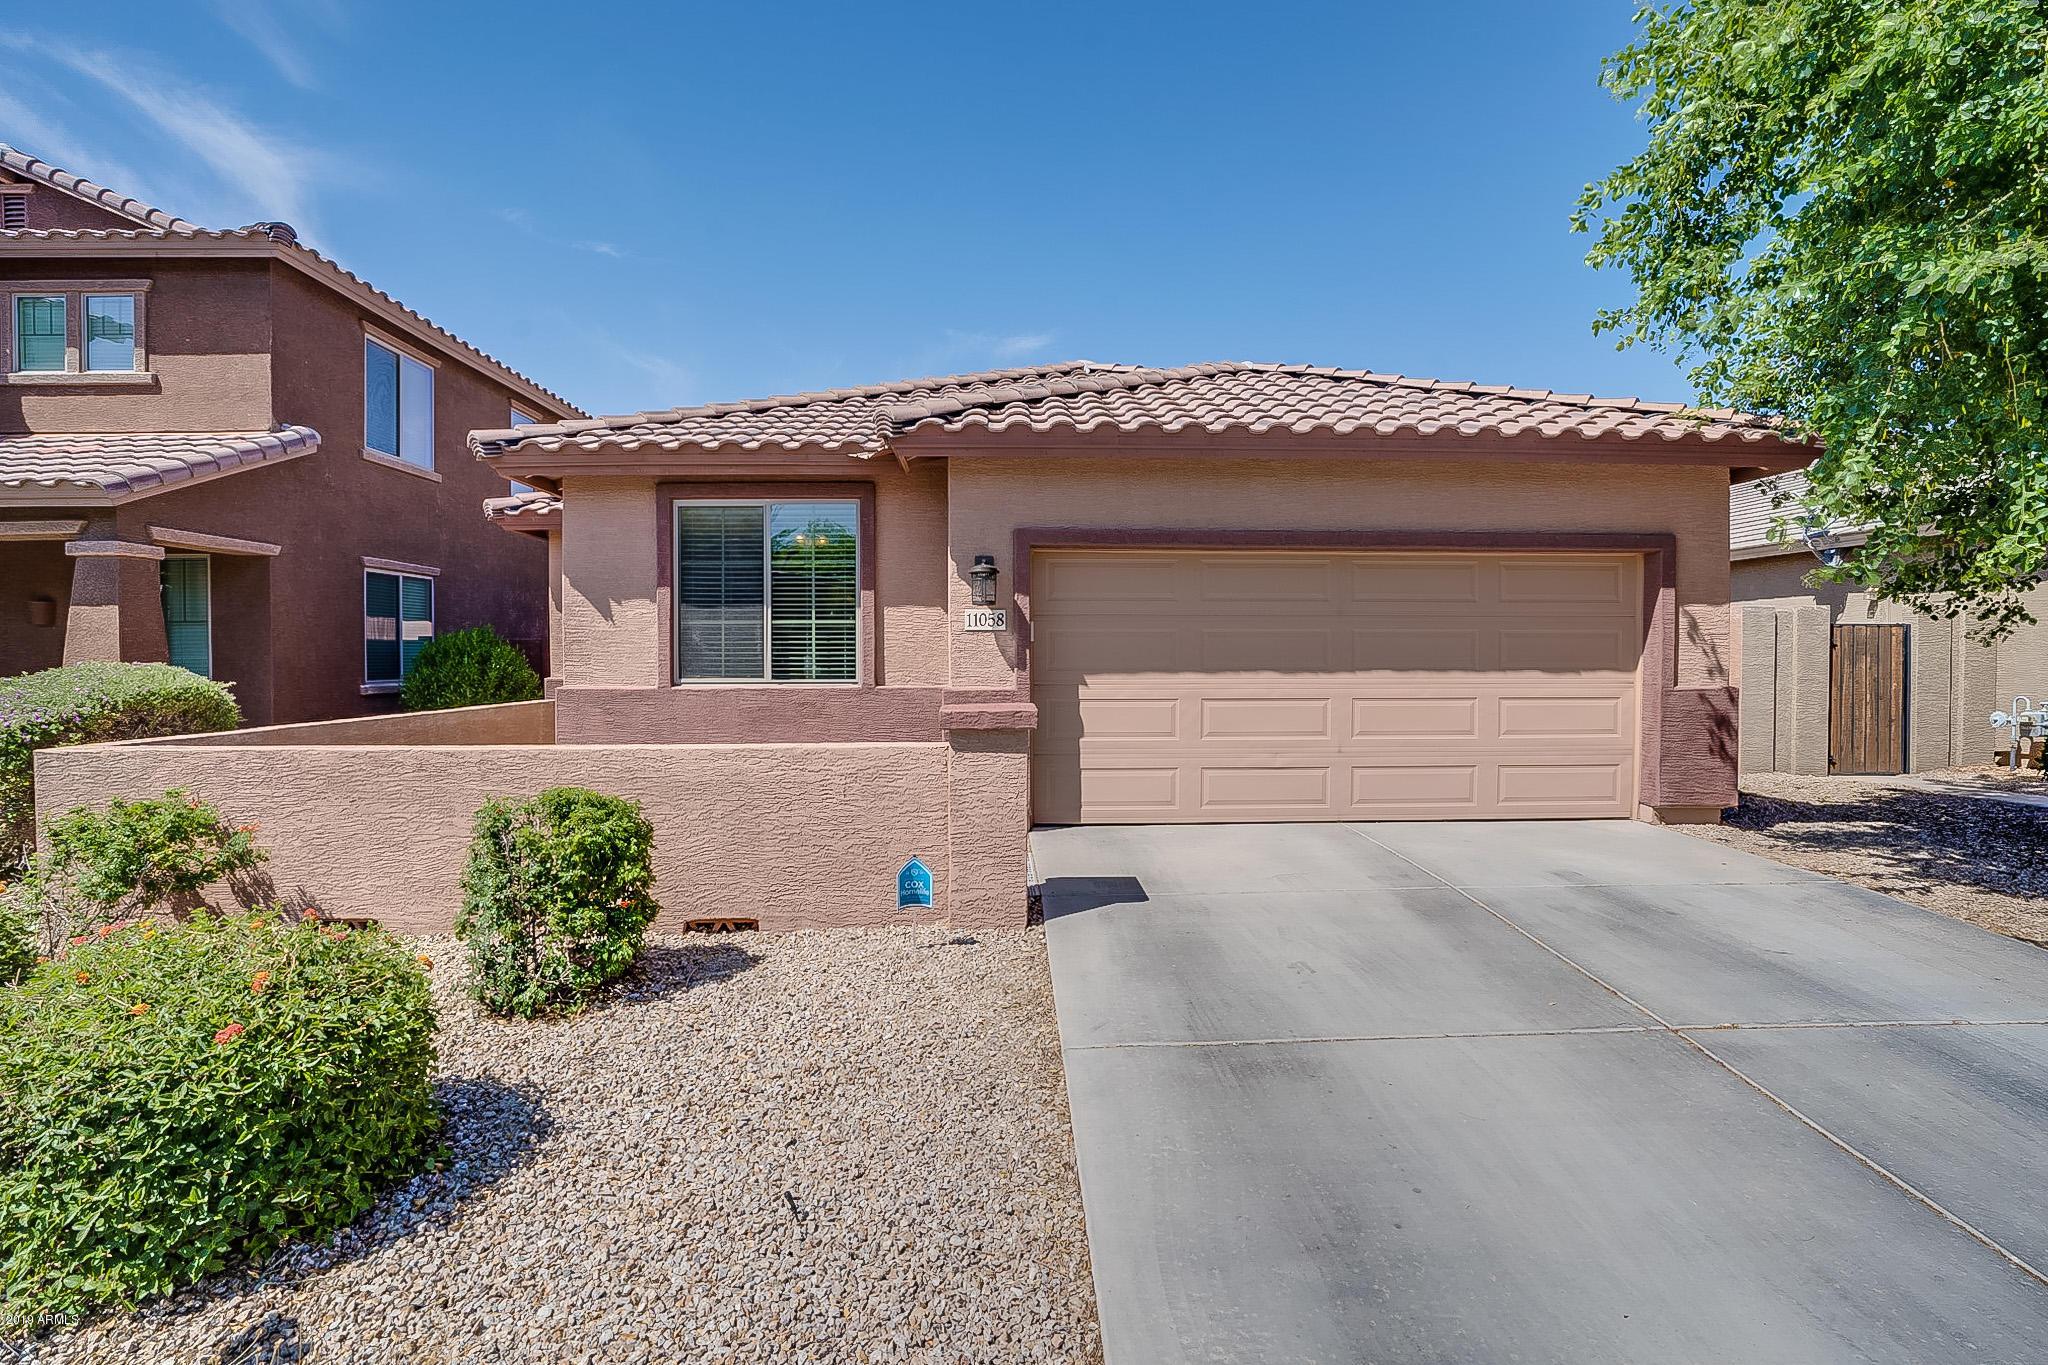 Photo of 11058 E SEGURA Avenue, Mesa, AZ 85212